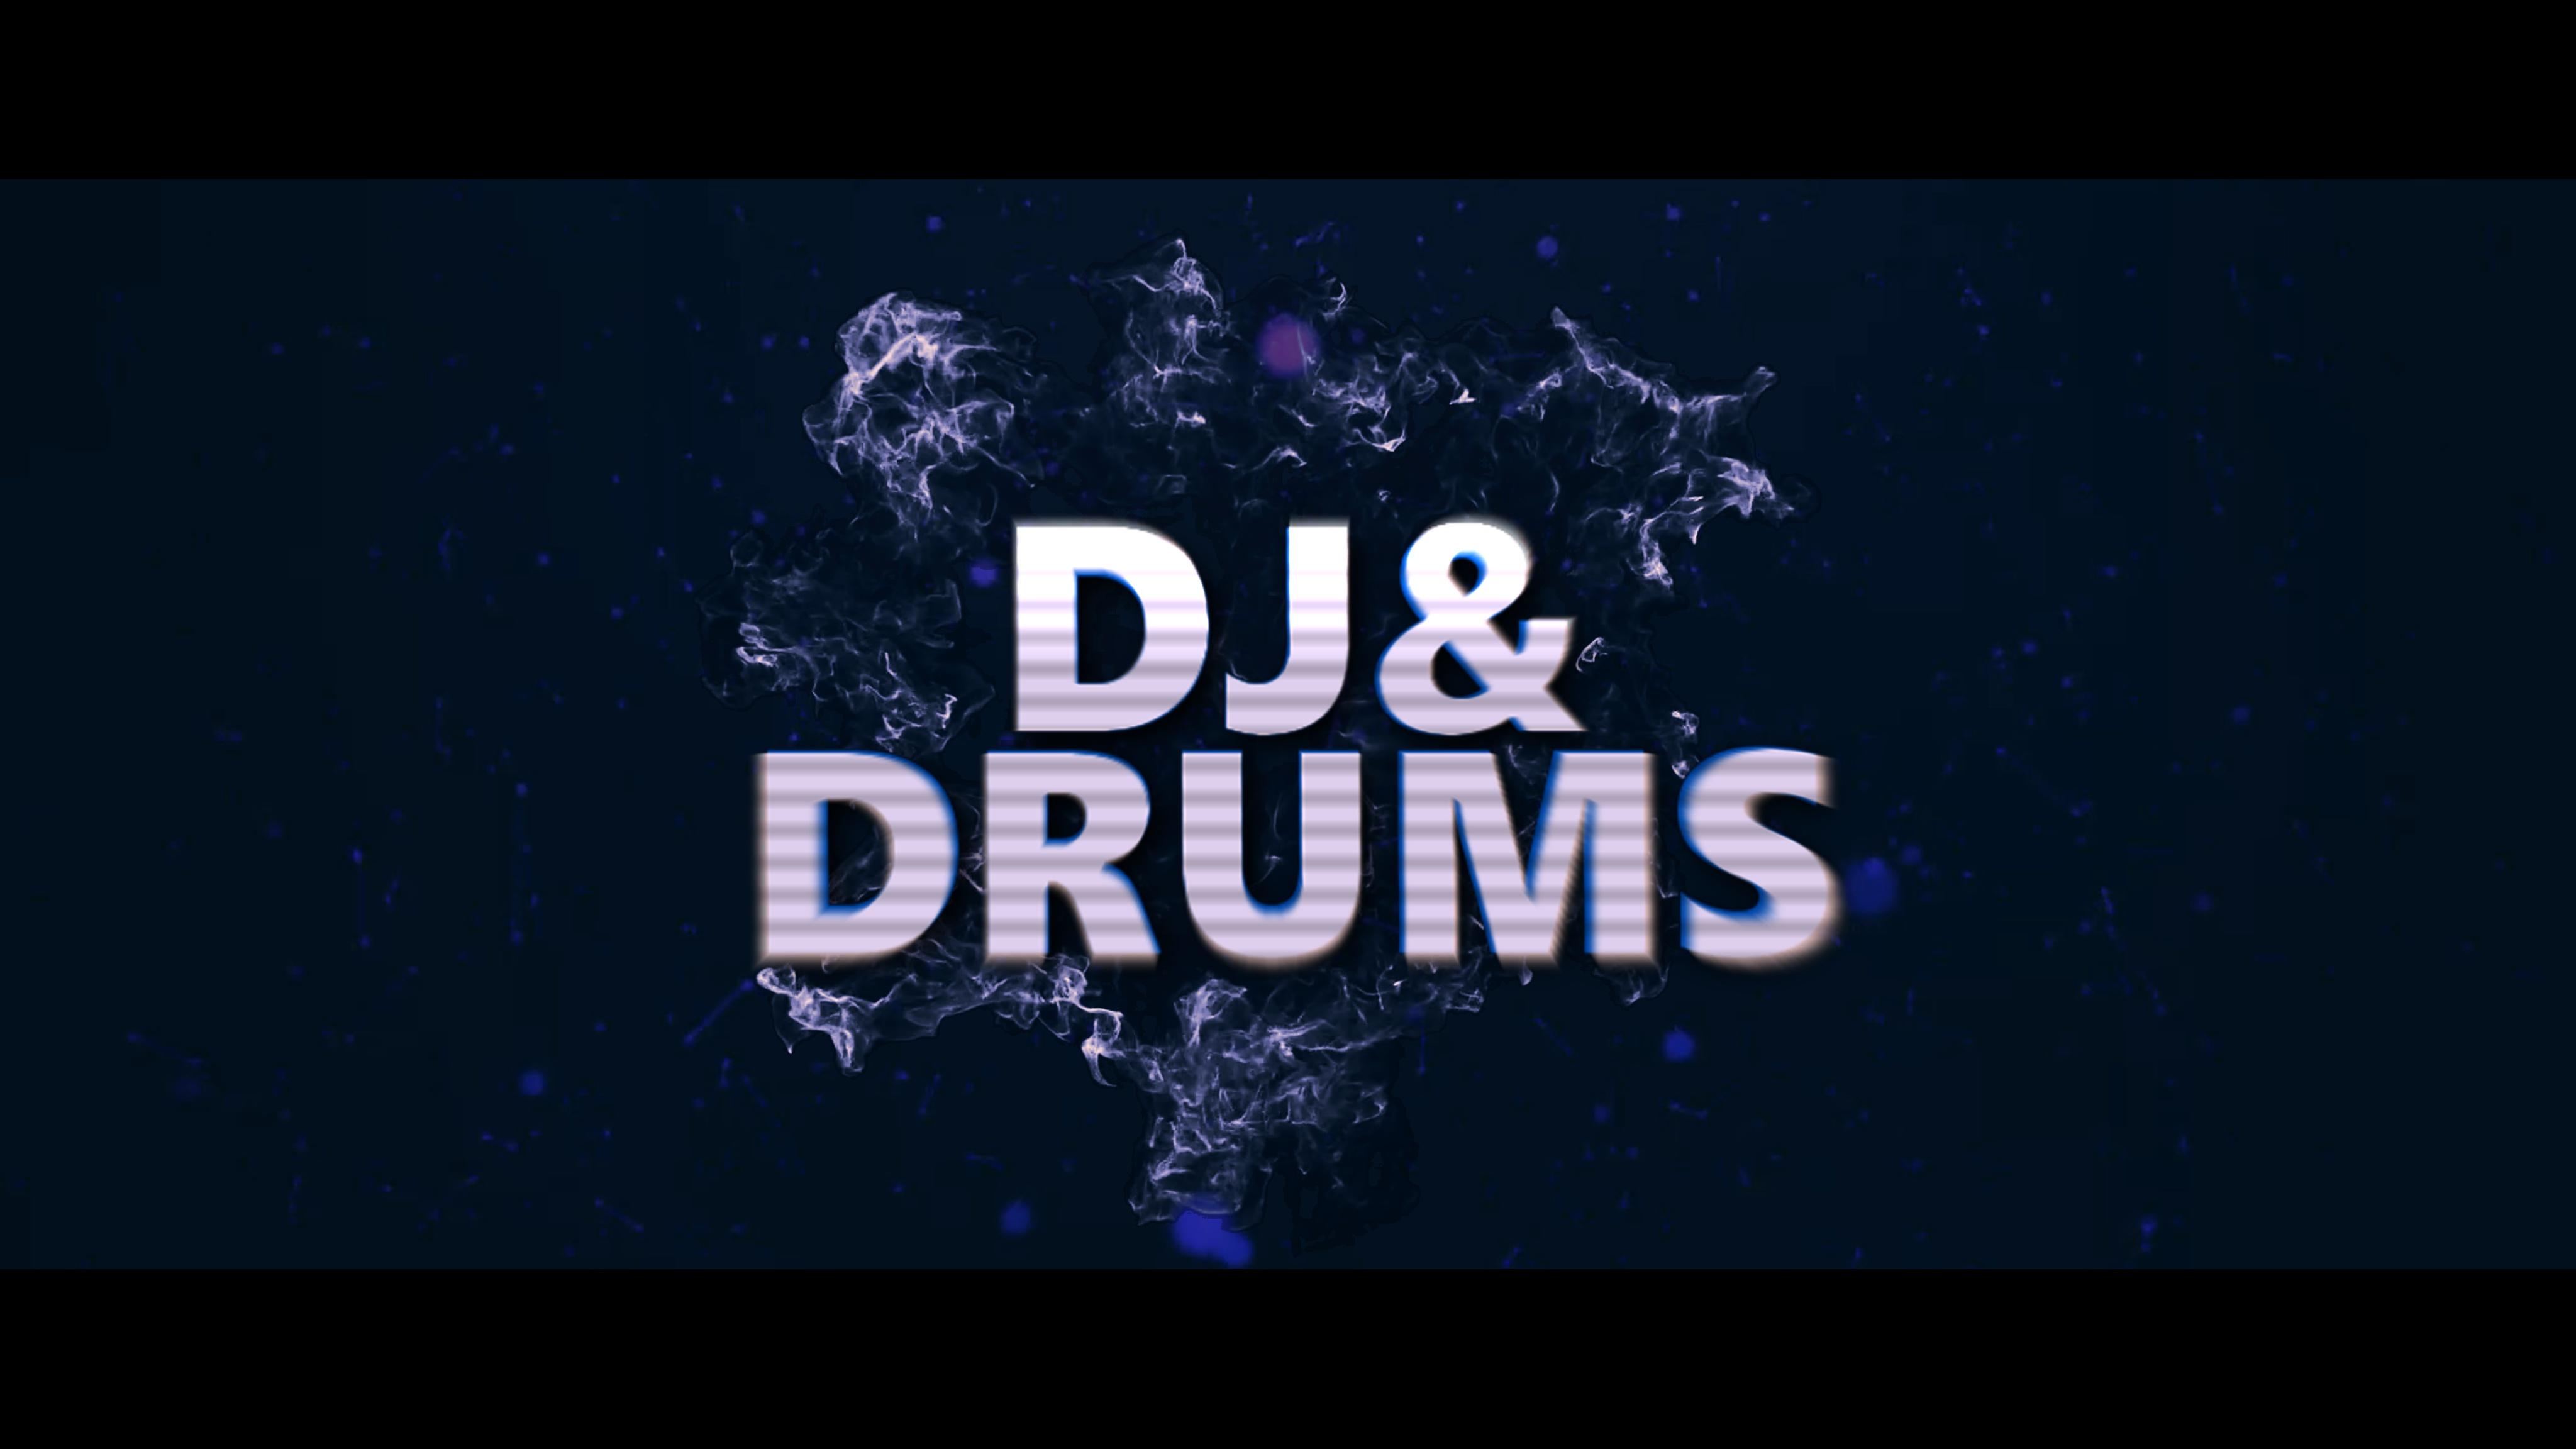 DJDRUMS